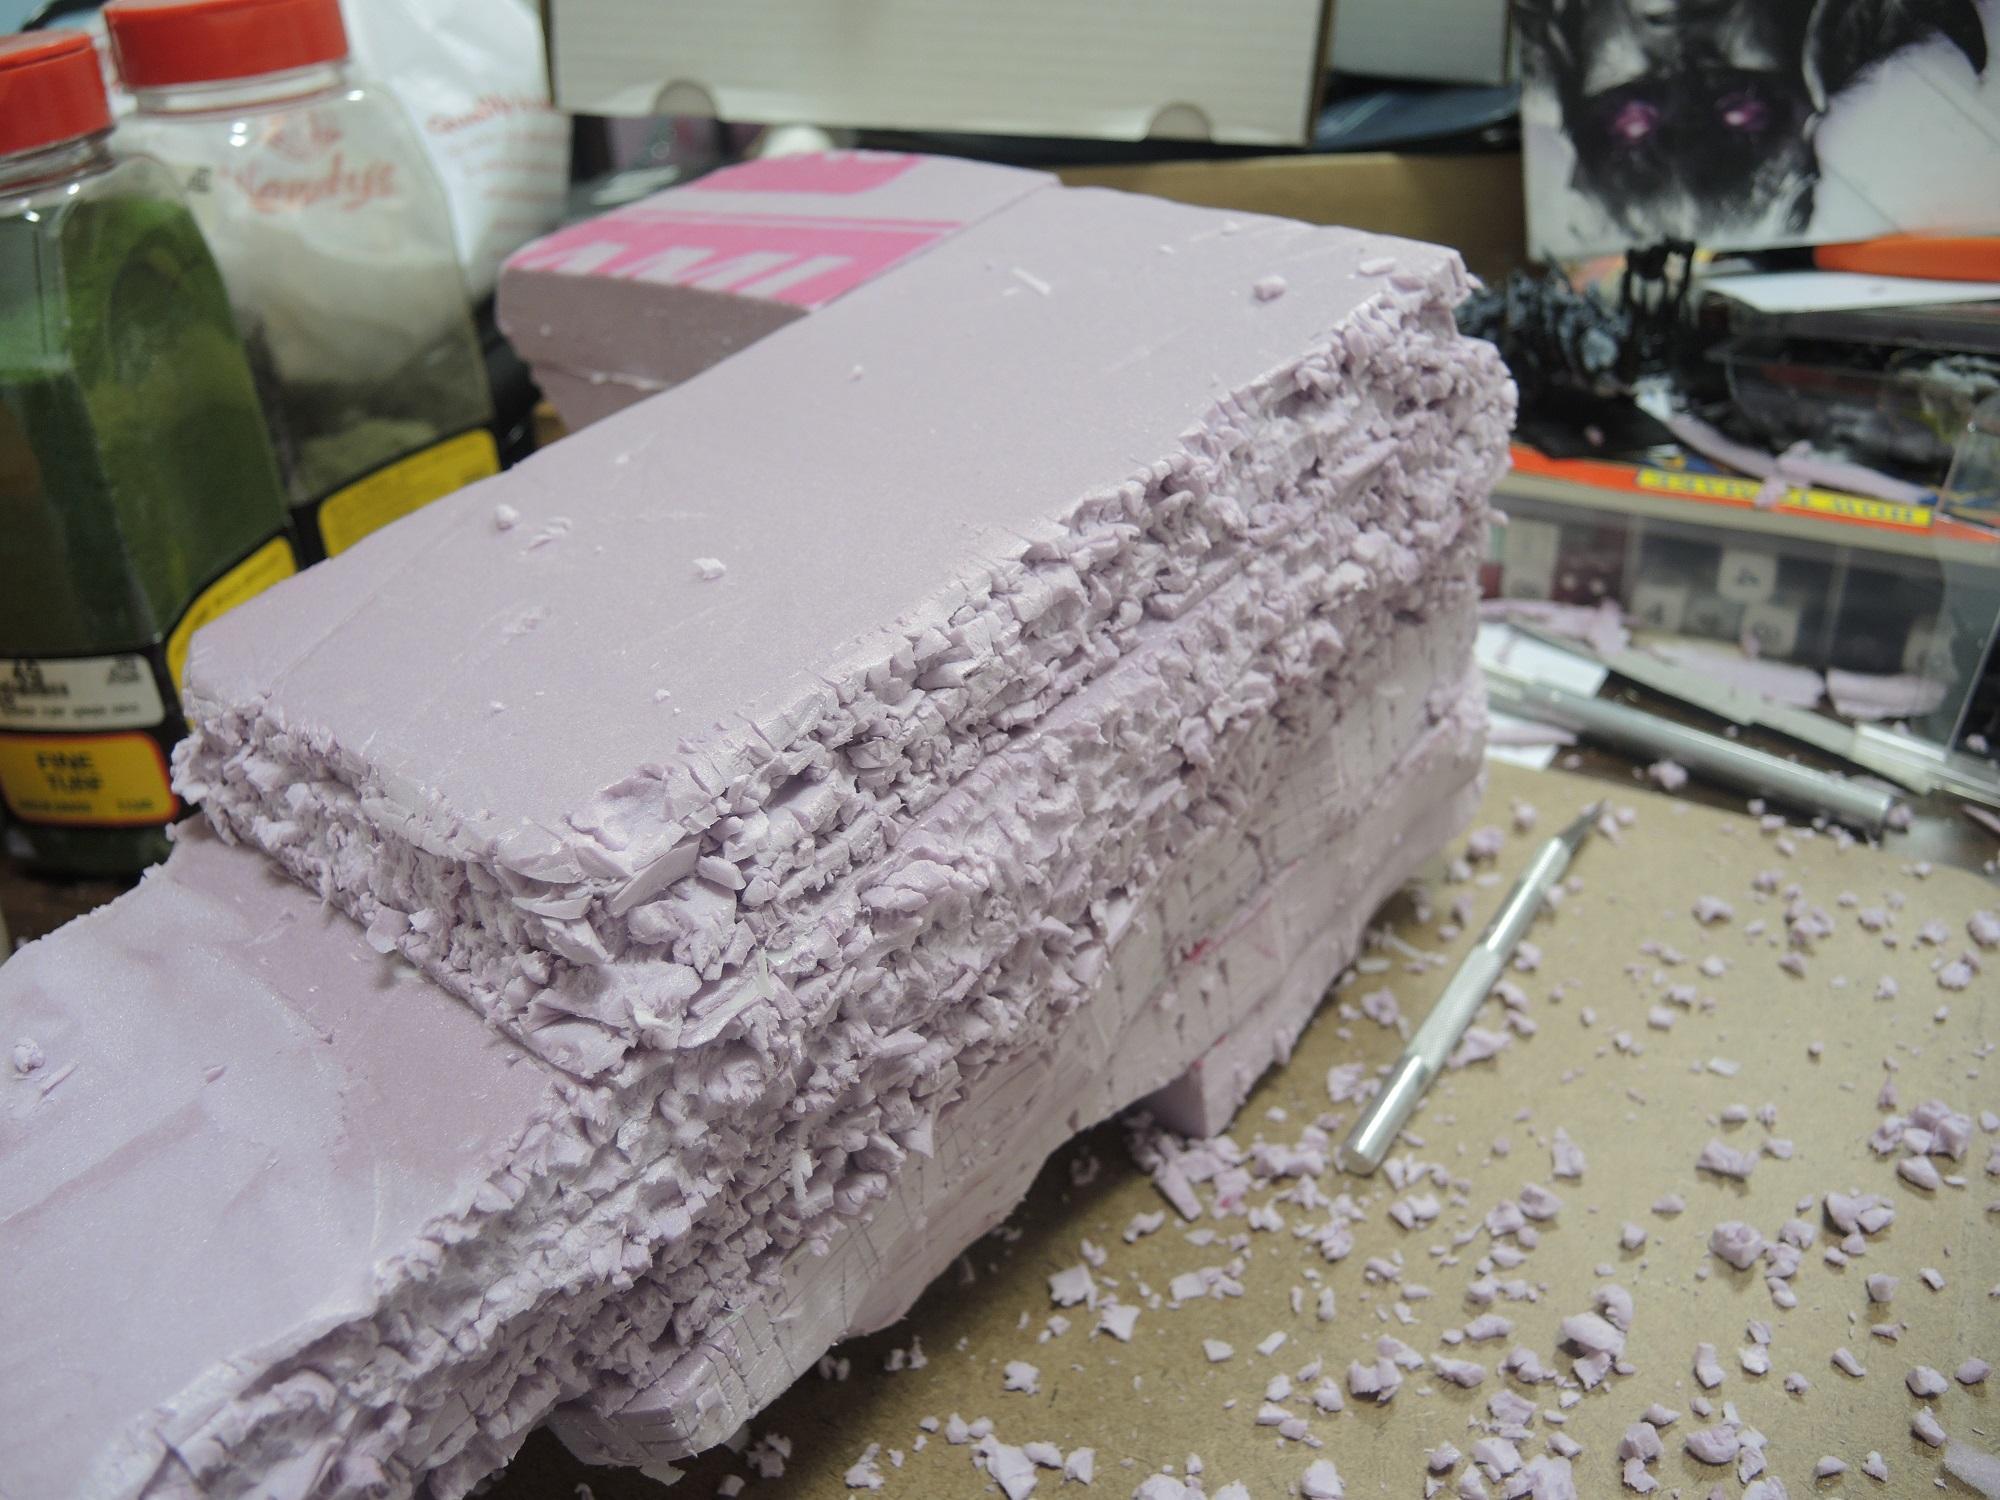 Blue, Commission, Hot Glue, Hotglue, Mesa, Pink, Styrofoam, Terrain, Tutorial, Waaazag, Waazag, Work In Progress